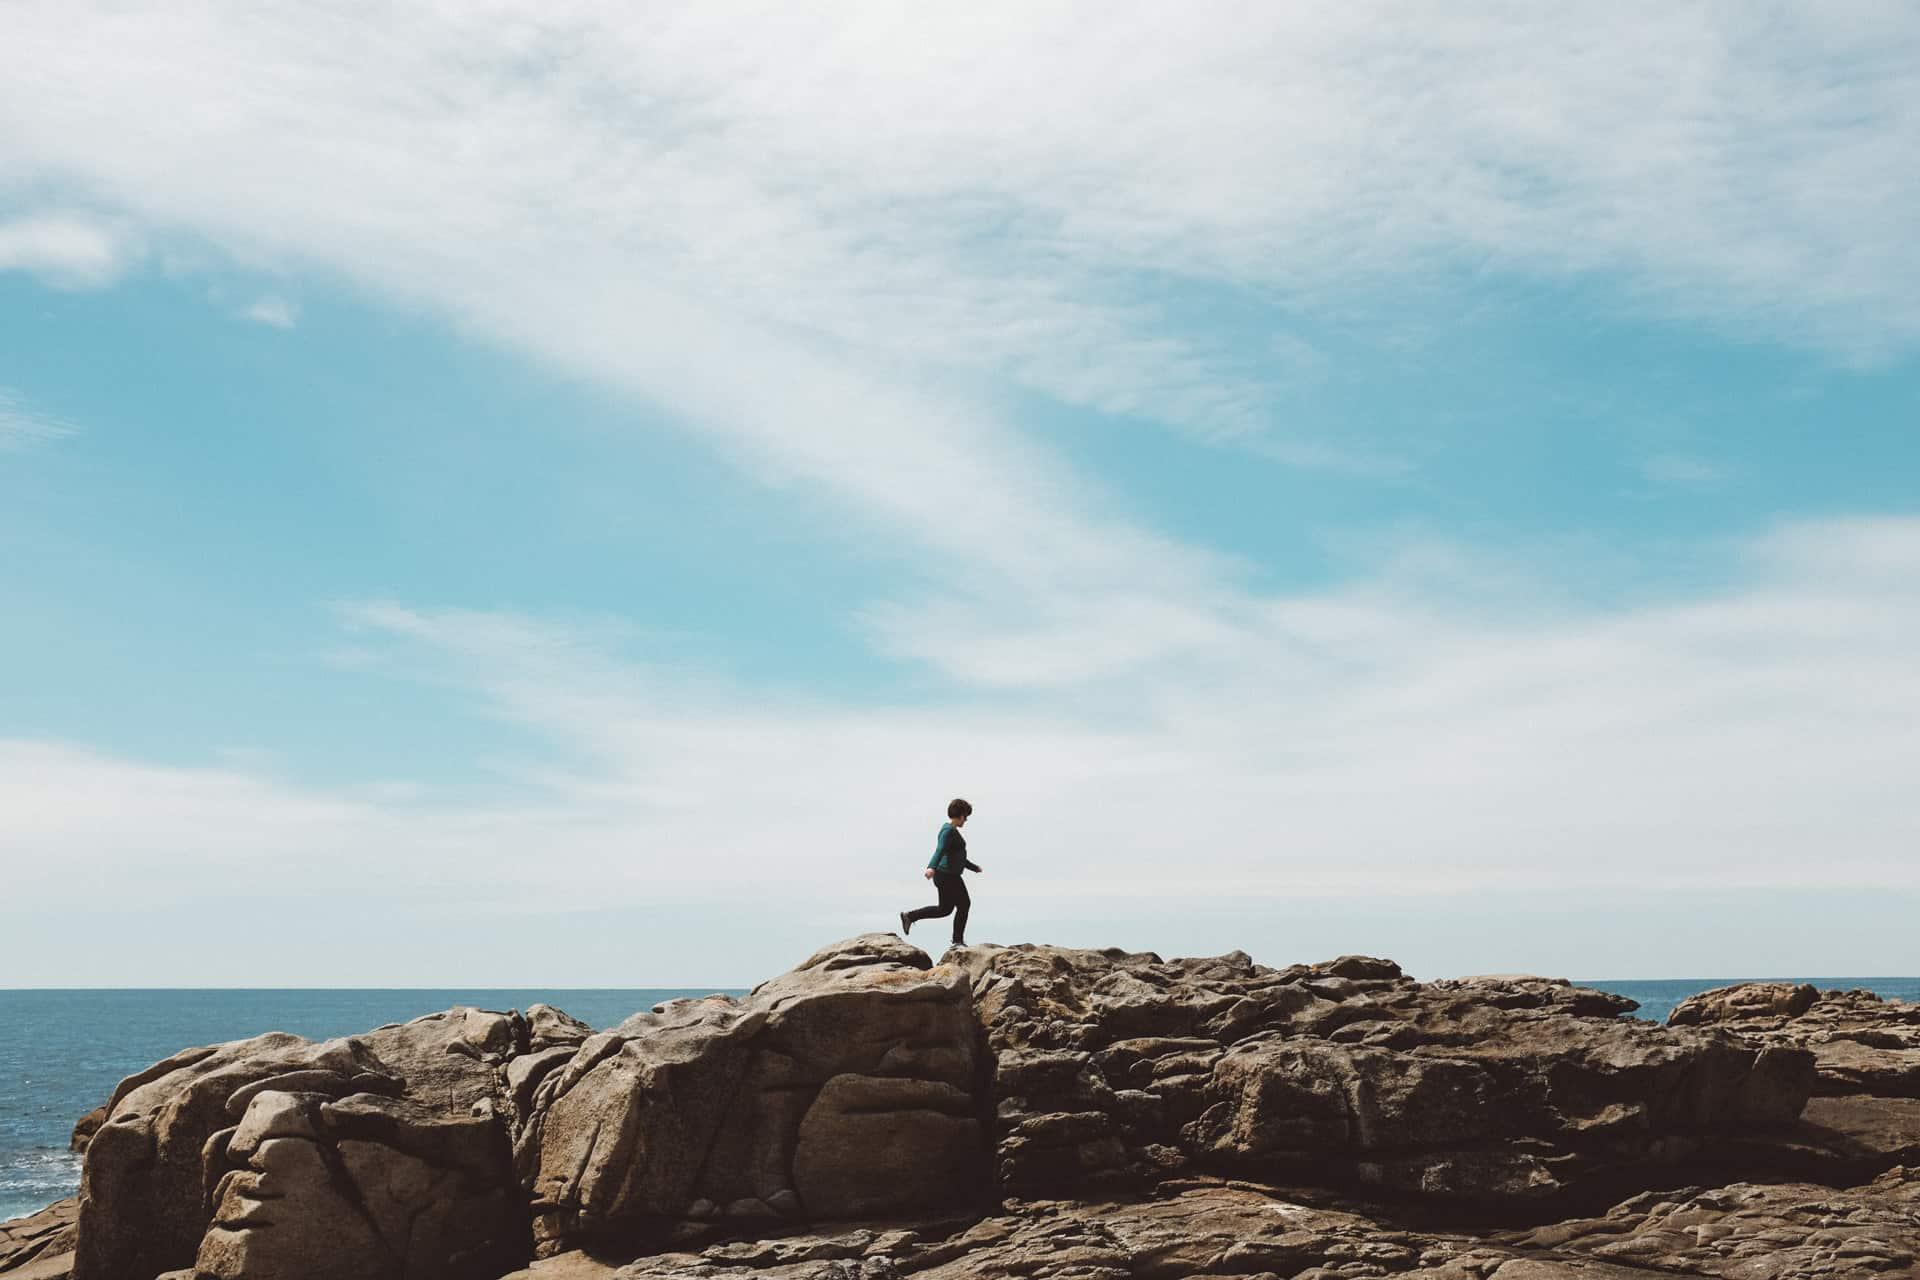 Marina on the rocks